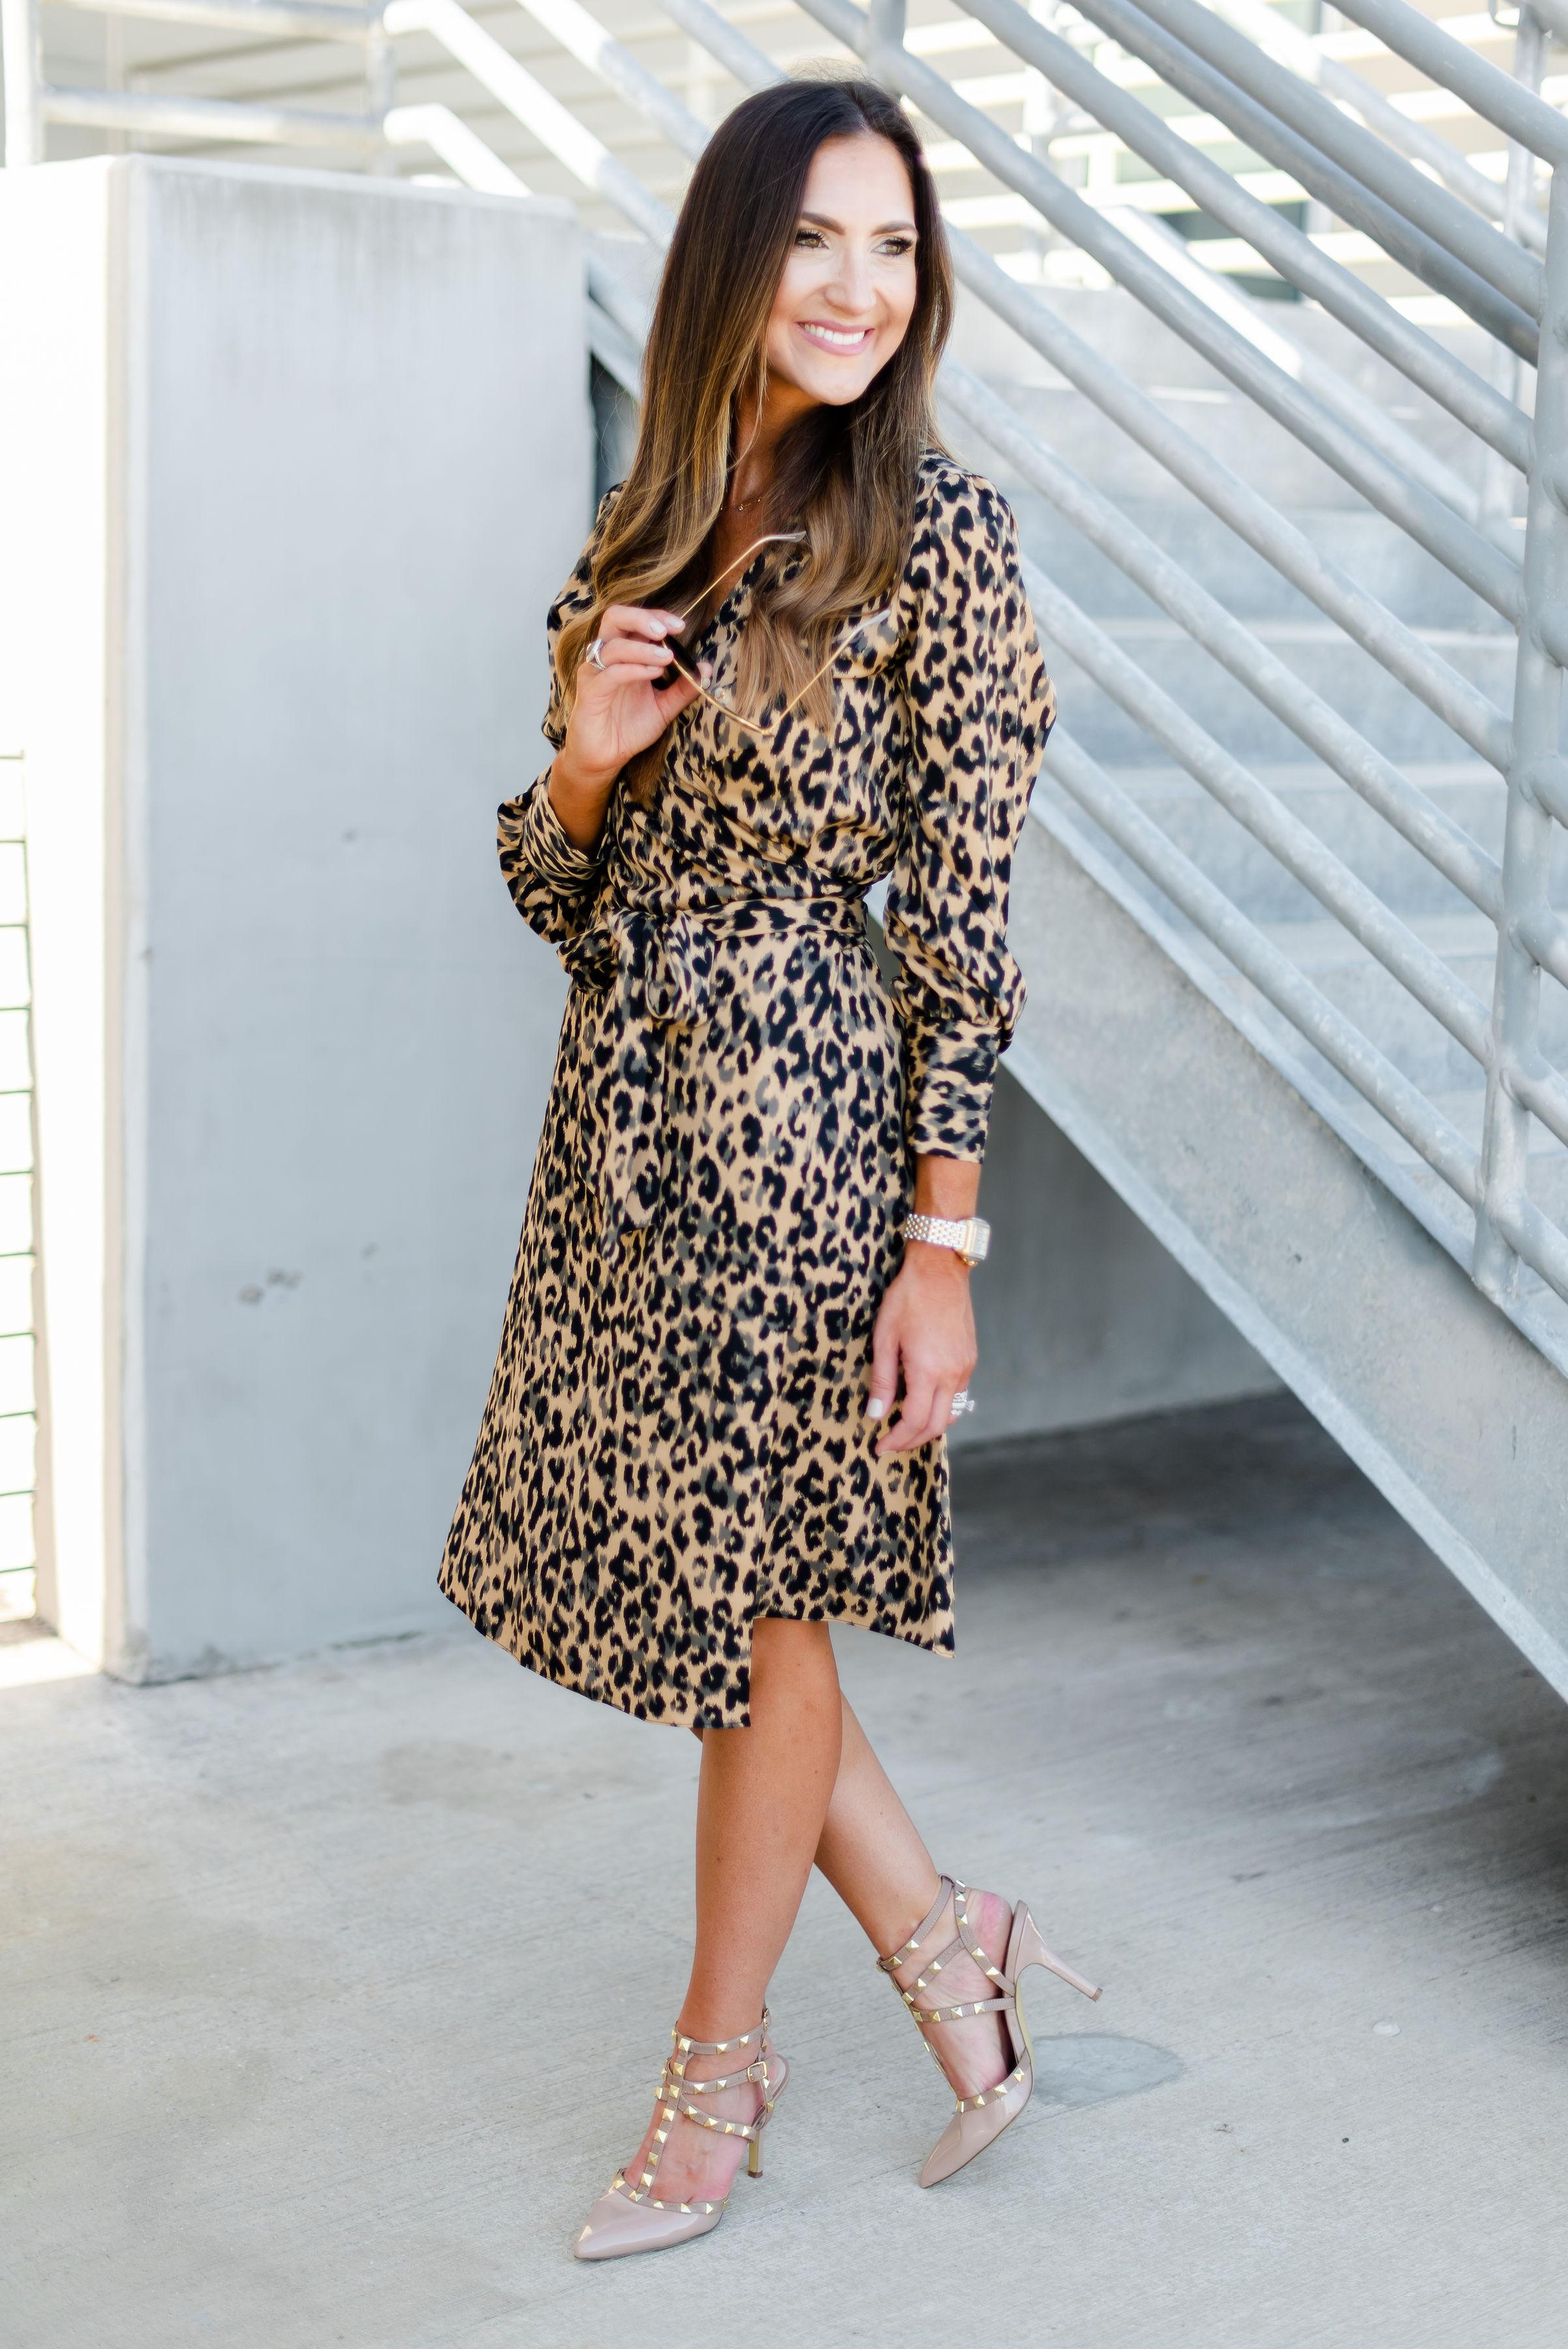 Wrap dress for work | leopard print l wrap dress | Nordstrom | Style Your Senses